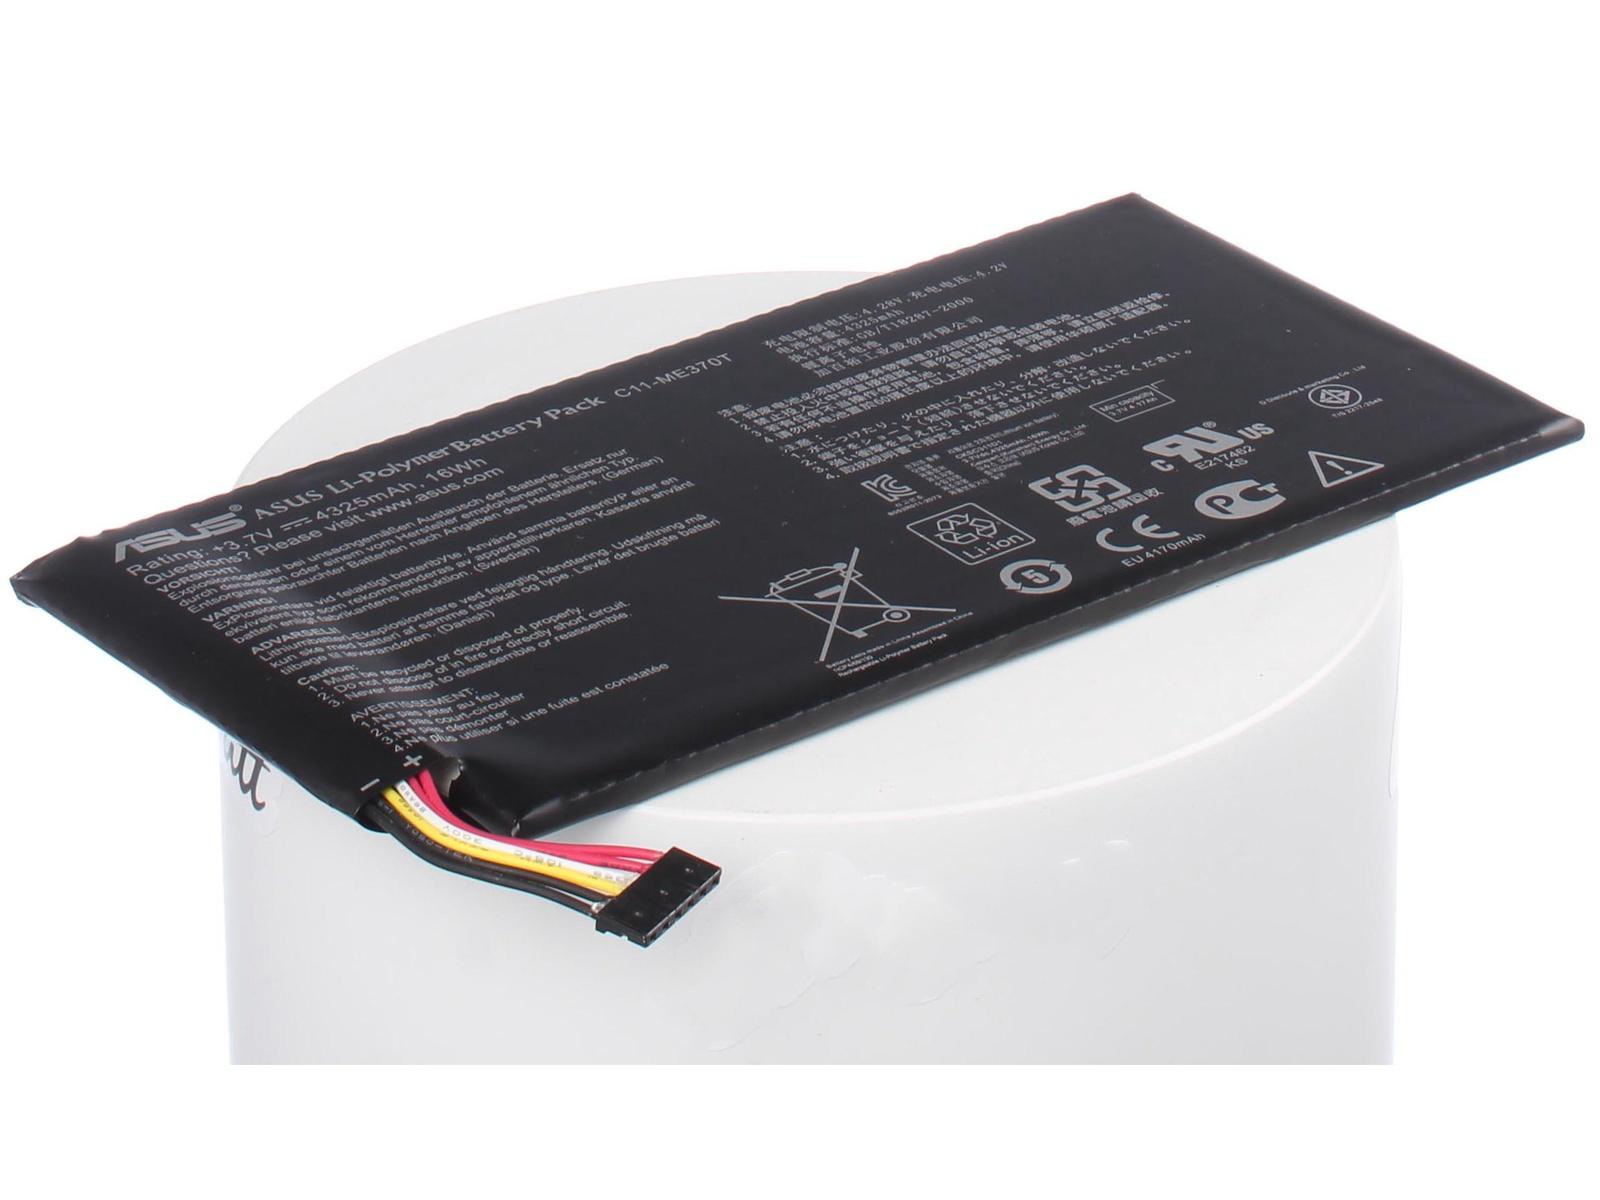 Аккумуляторная батарея iBatt iB-A1-A655 4300mAh для ноутбуков Asus база ноутбуков